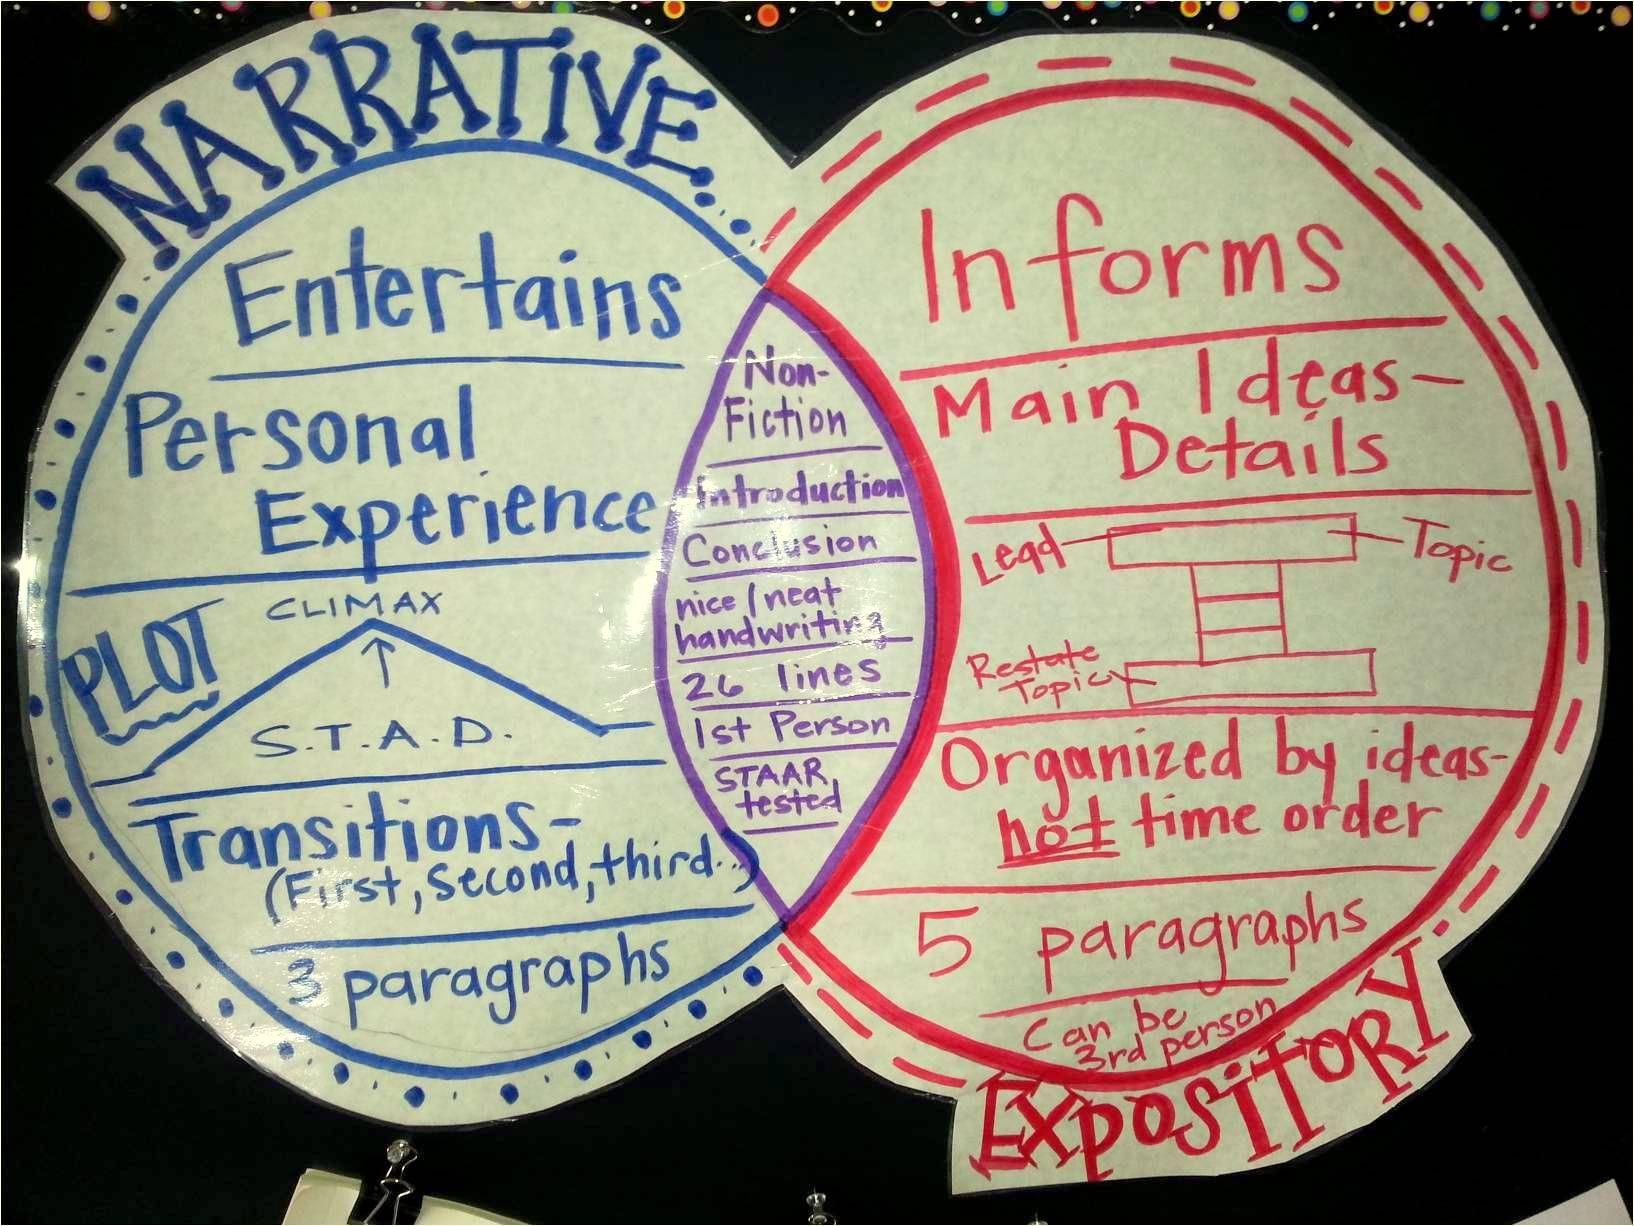 Narrative Vs Expository Genre Anchor Chart Photo Credit